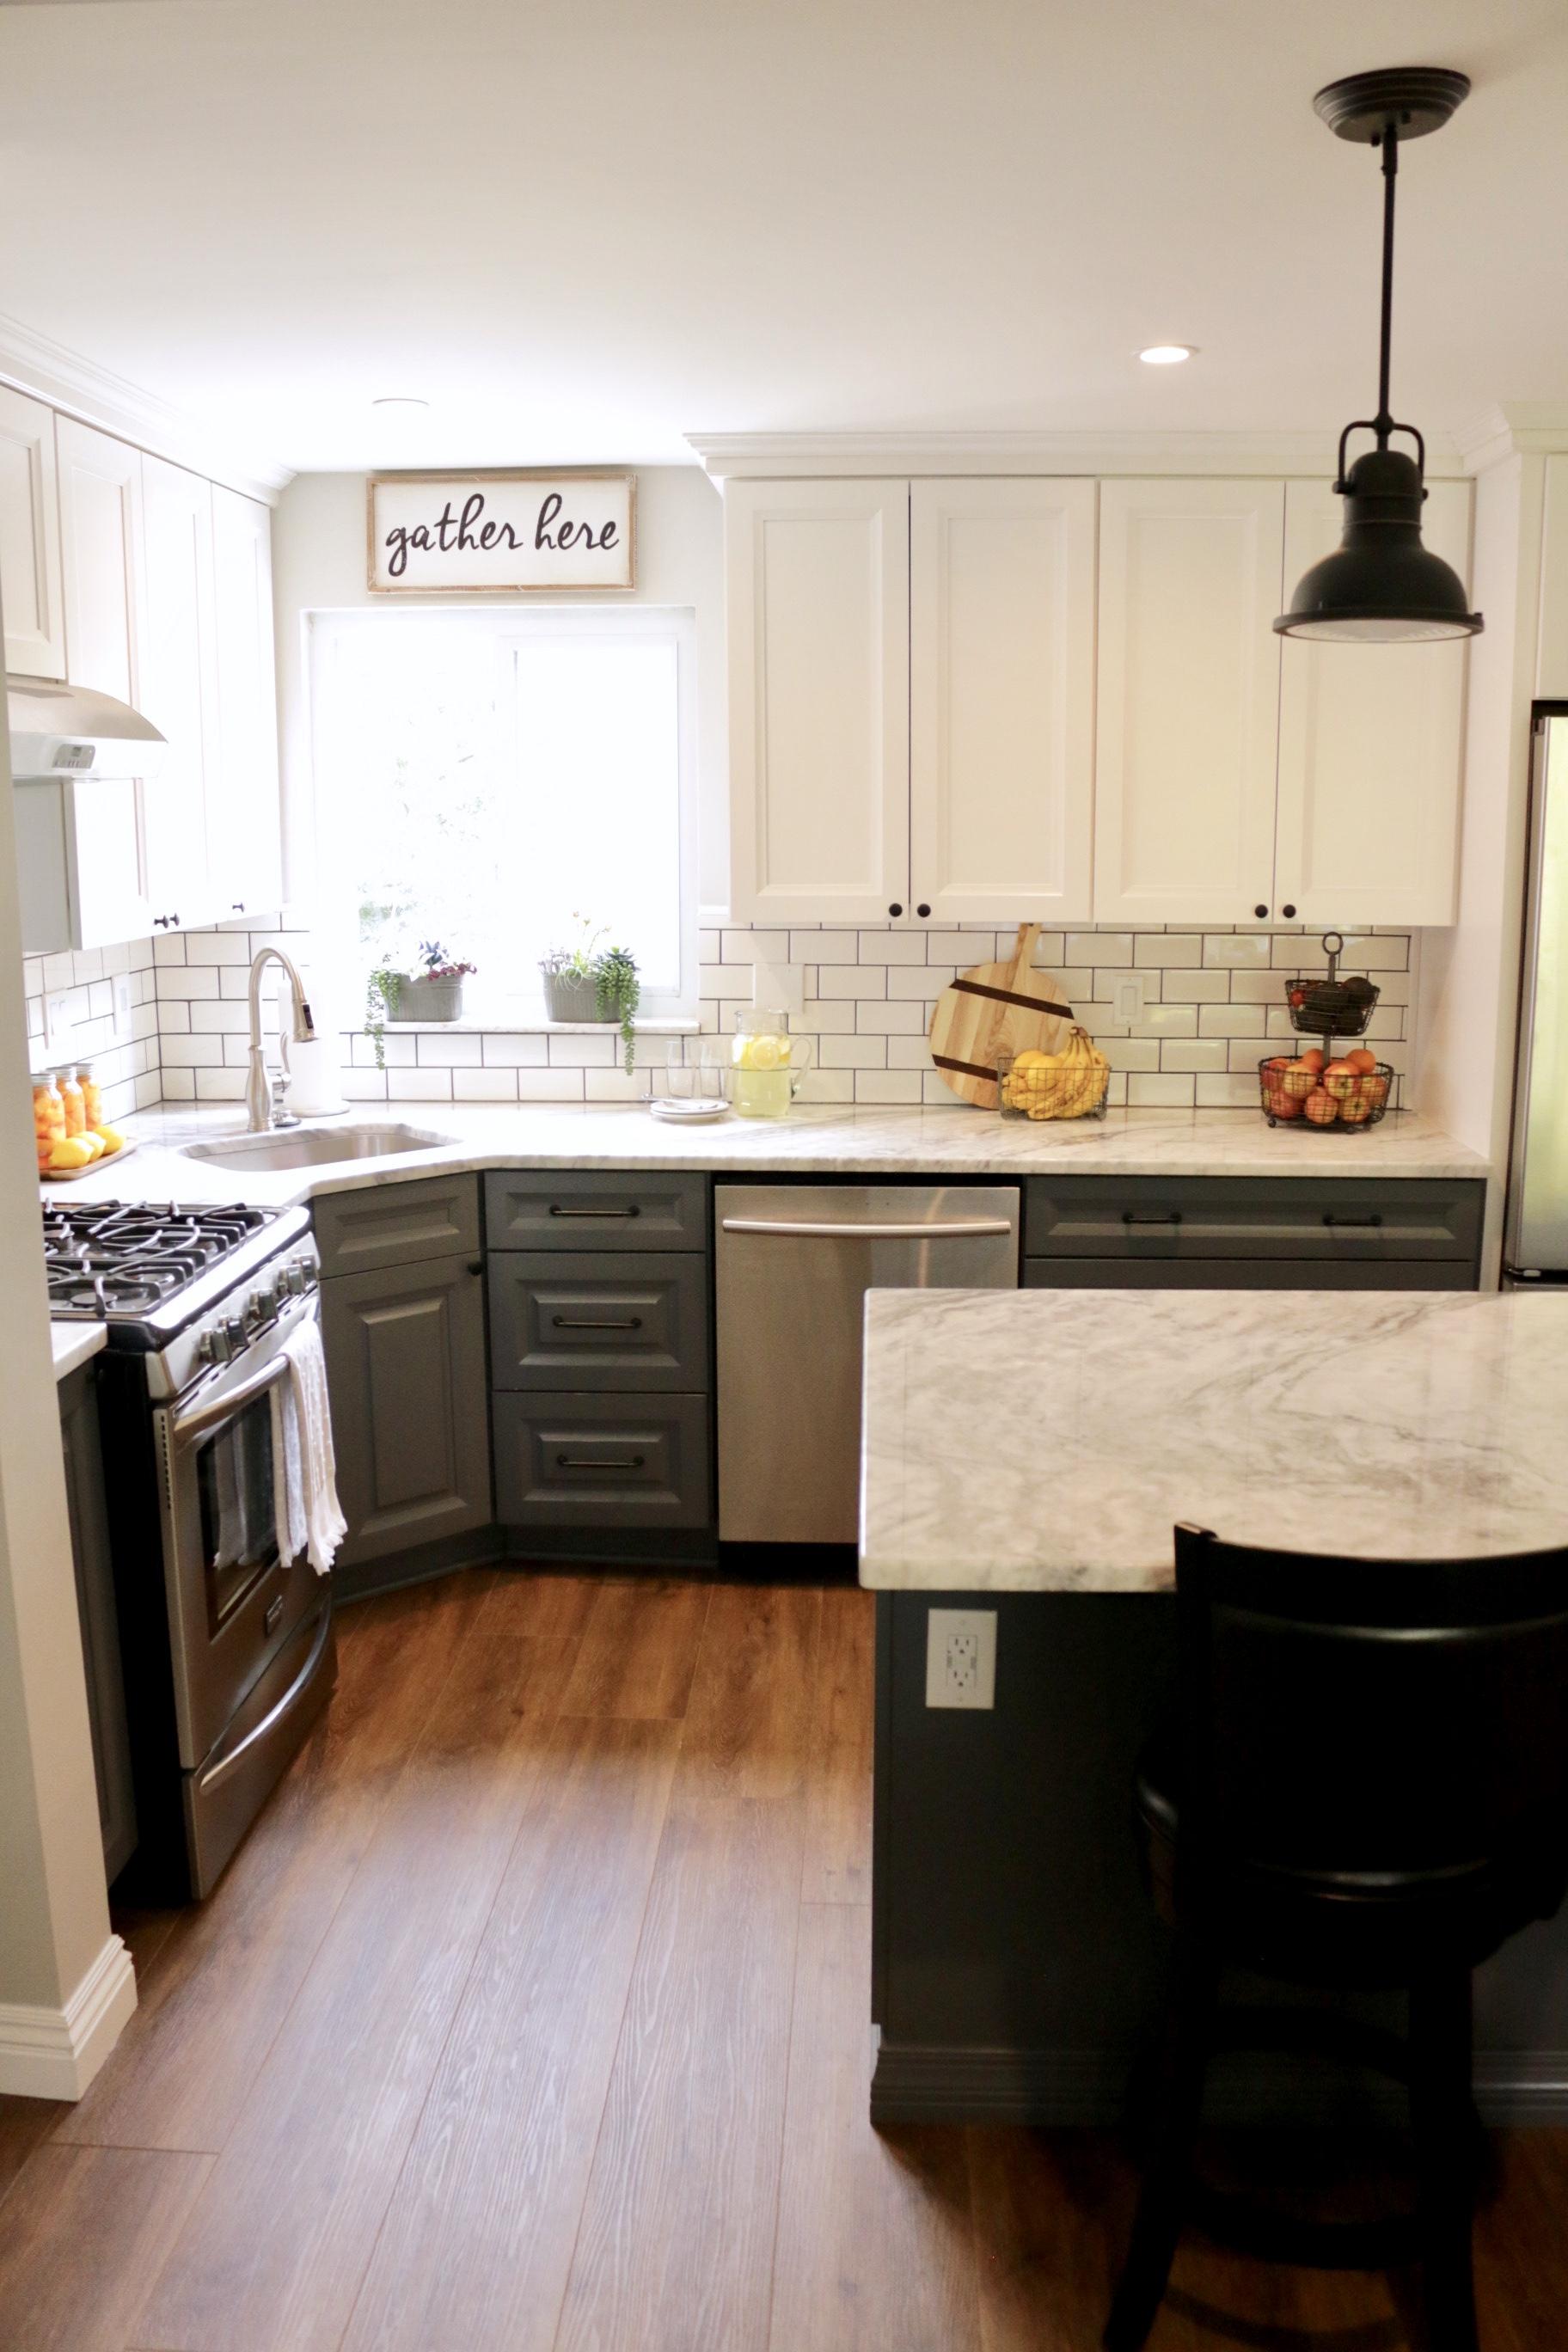 Bright White & Grey Cabinets